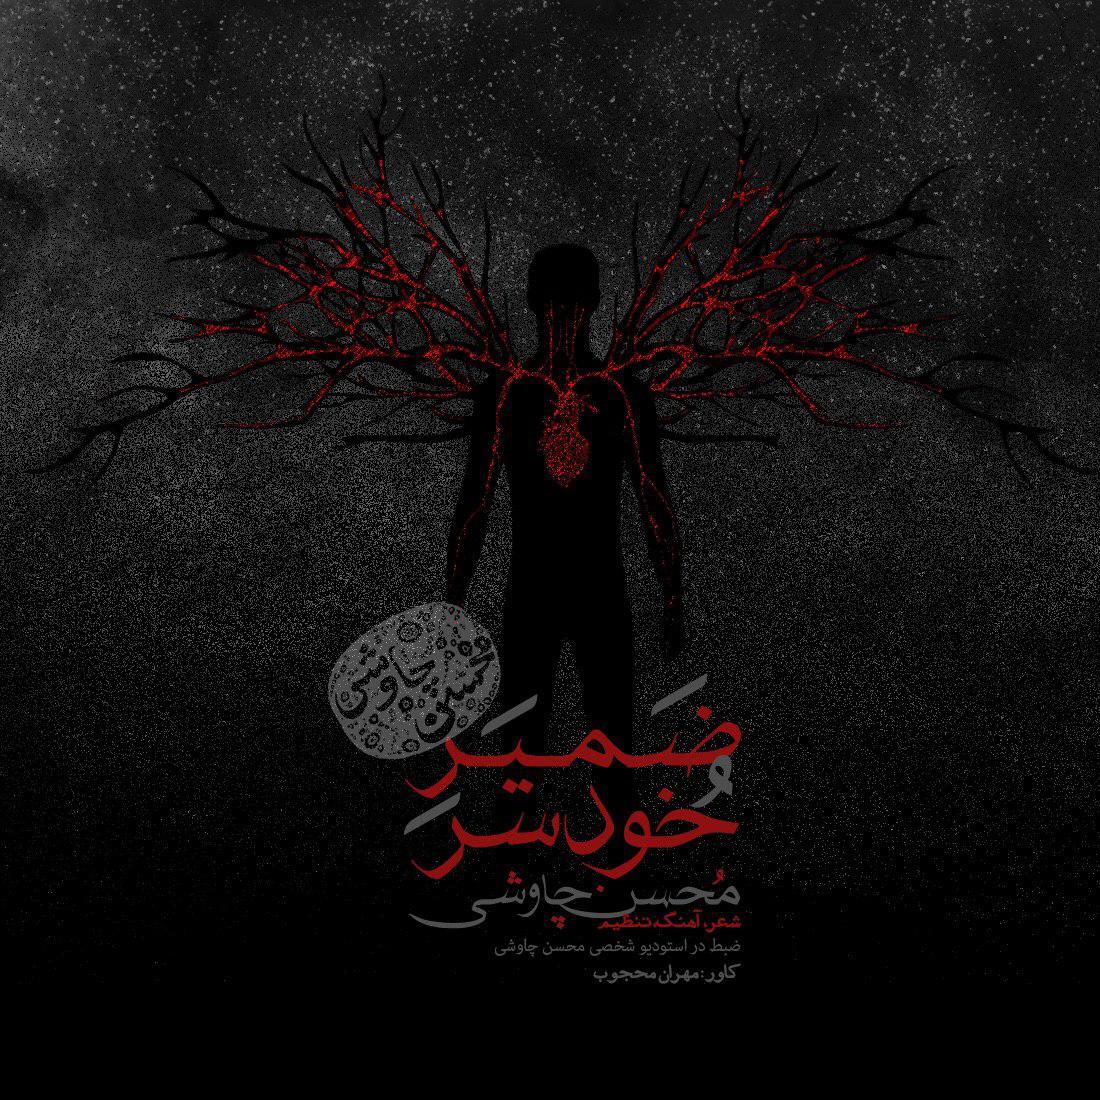 Mohsen Chavoshi - Zamire Khodsar - دانلود آهنگ محسن چاوشی به نام ضمیر خودسر